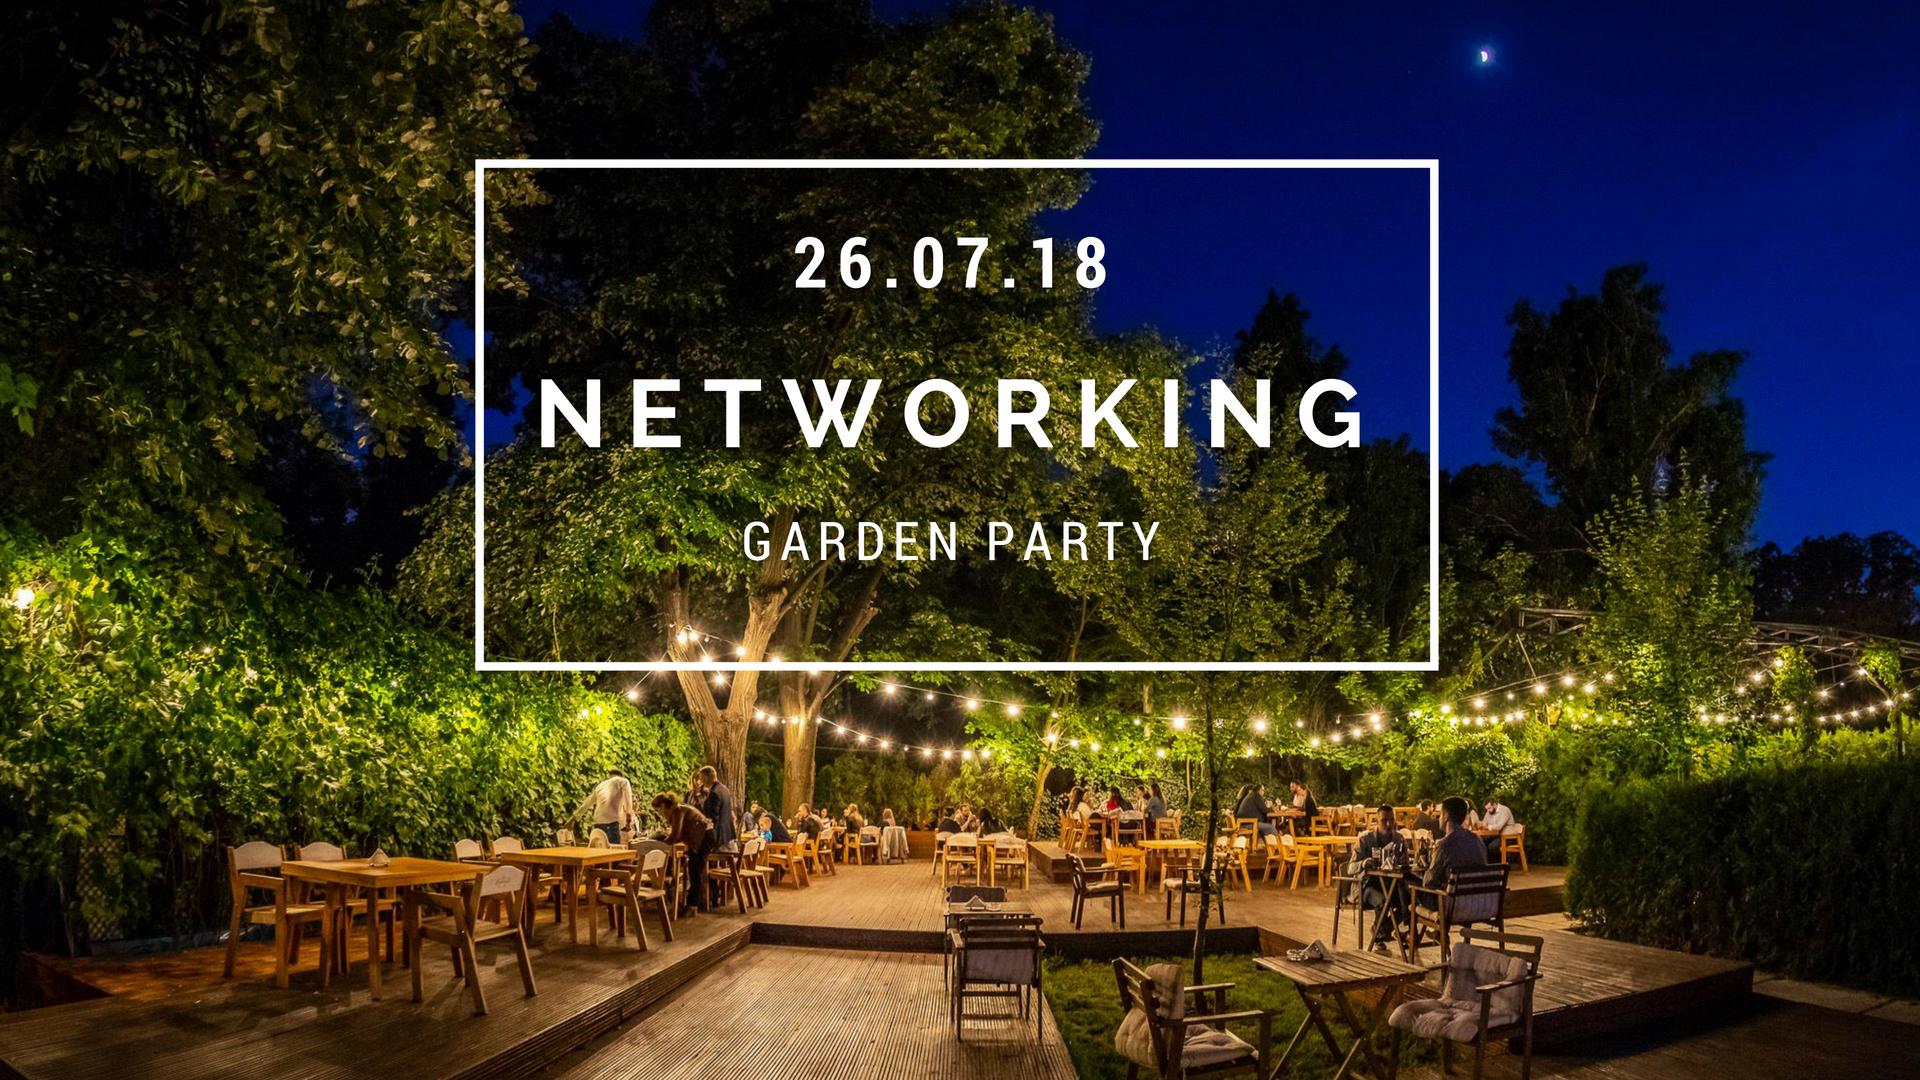 EVENIMENT NETWORKING – GARDEN PARTY